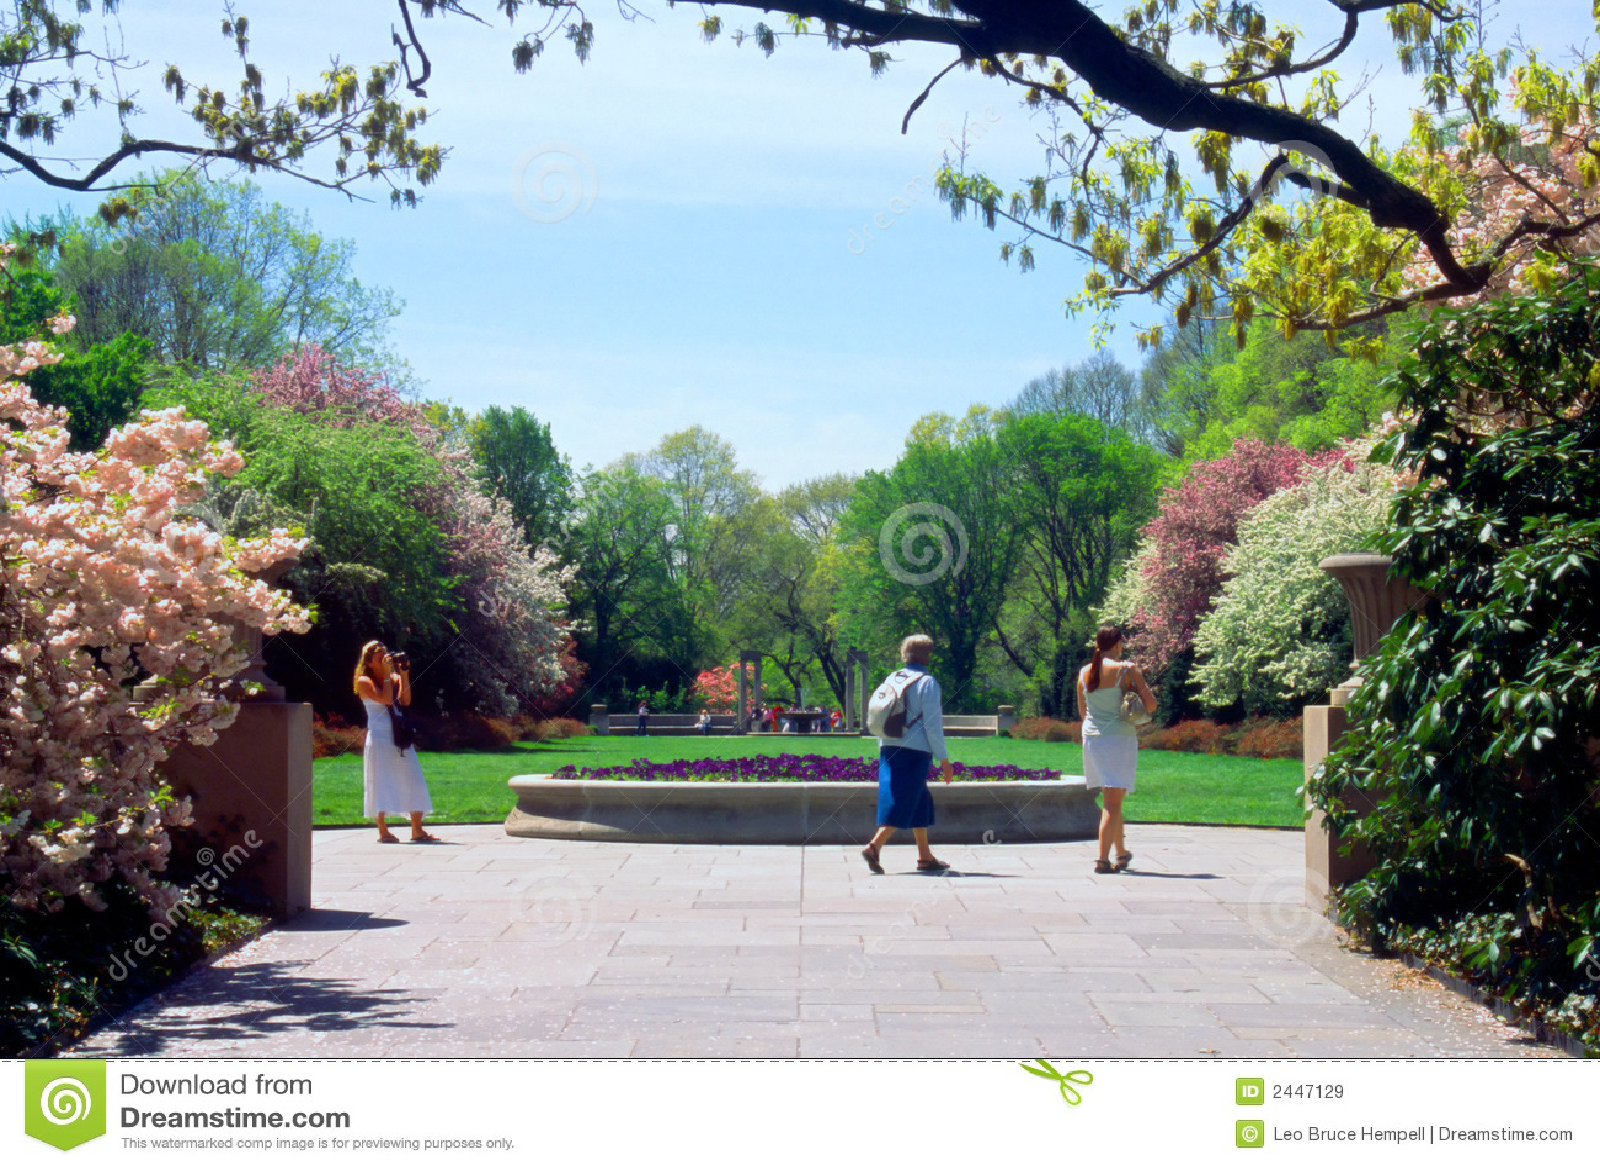 Tourists Brooklyn Botanic Garden New York Usa Royalty Free